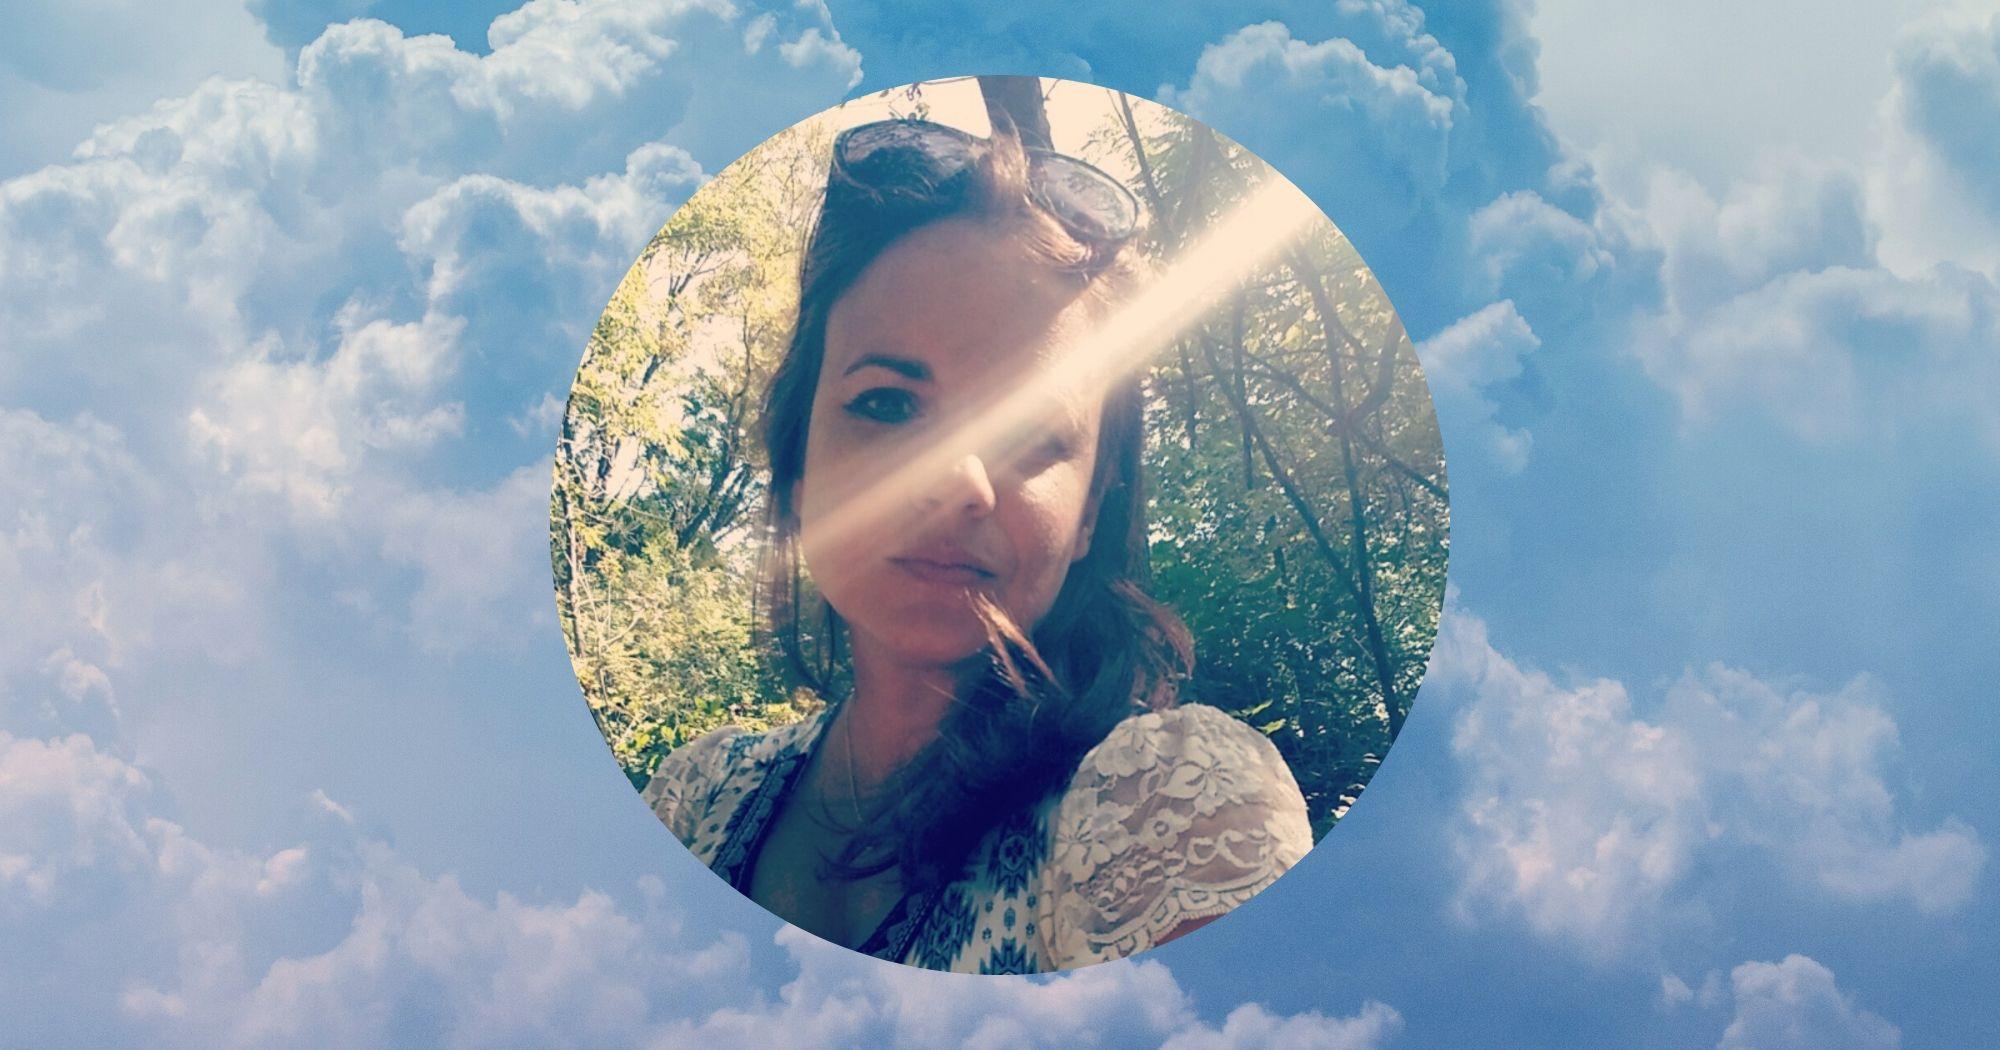 flight attendant ocd covid-19 coronavirus obsessive compulsive disorder Amy Shawley